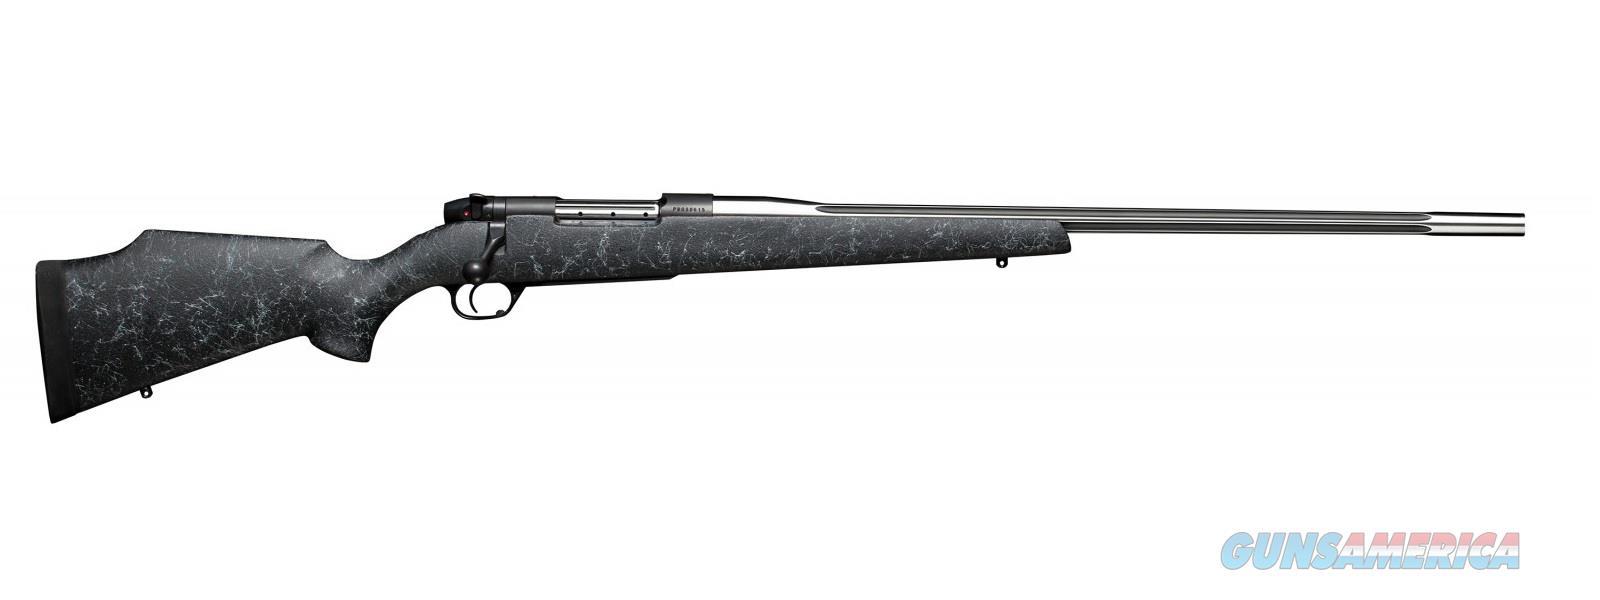 "Weatherby Mark V Accumark 6.5 Creedmoor 24"" MAMS65CMR4O   Guns > Rifles > Weatherby Rifles > Sporting"